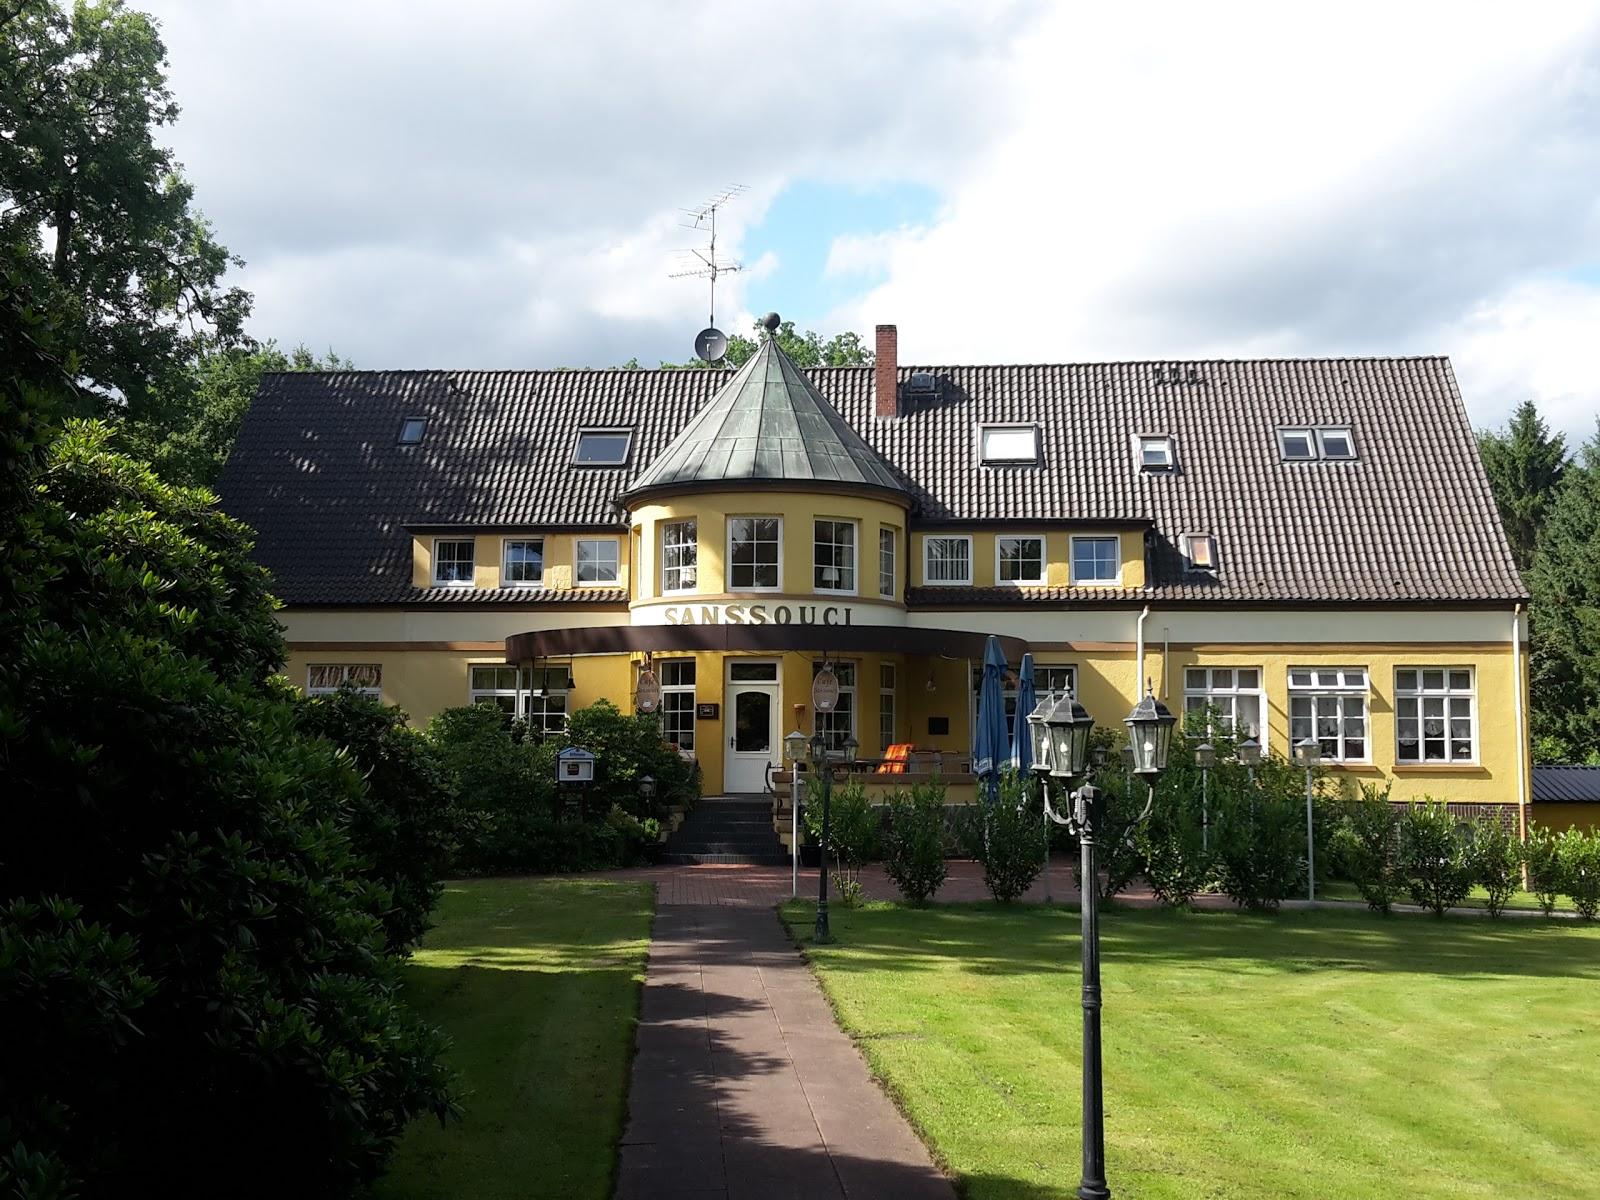 Familie Wildung Map - Walsrode, Germany - Mapcarta